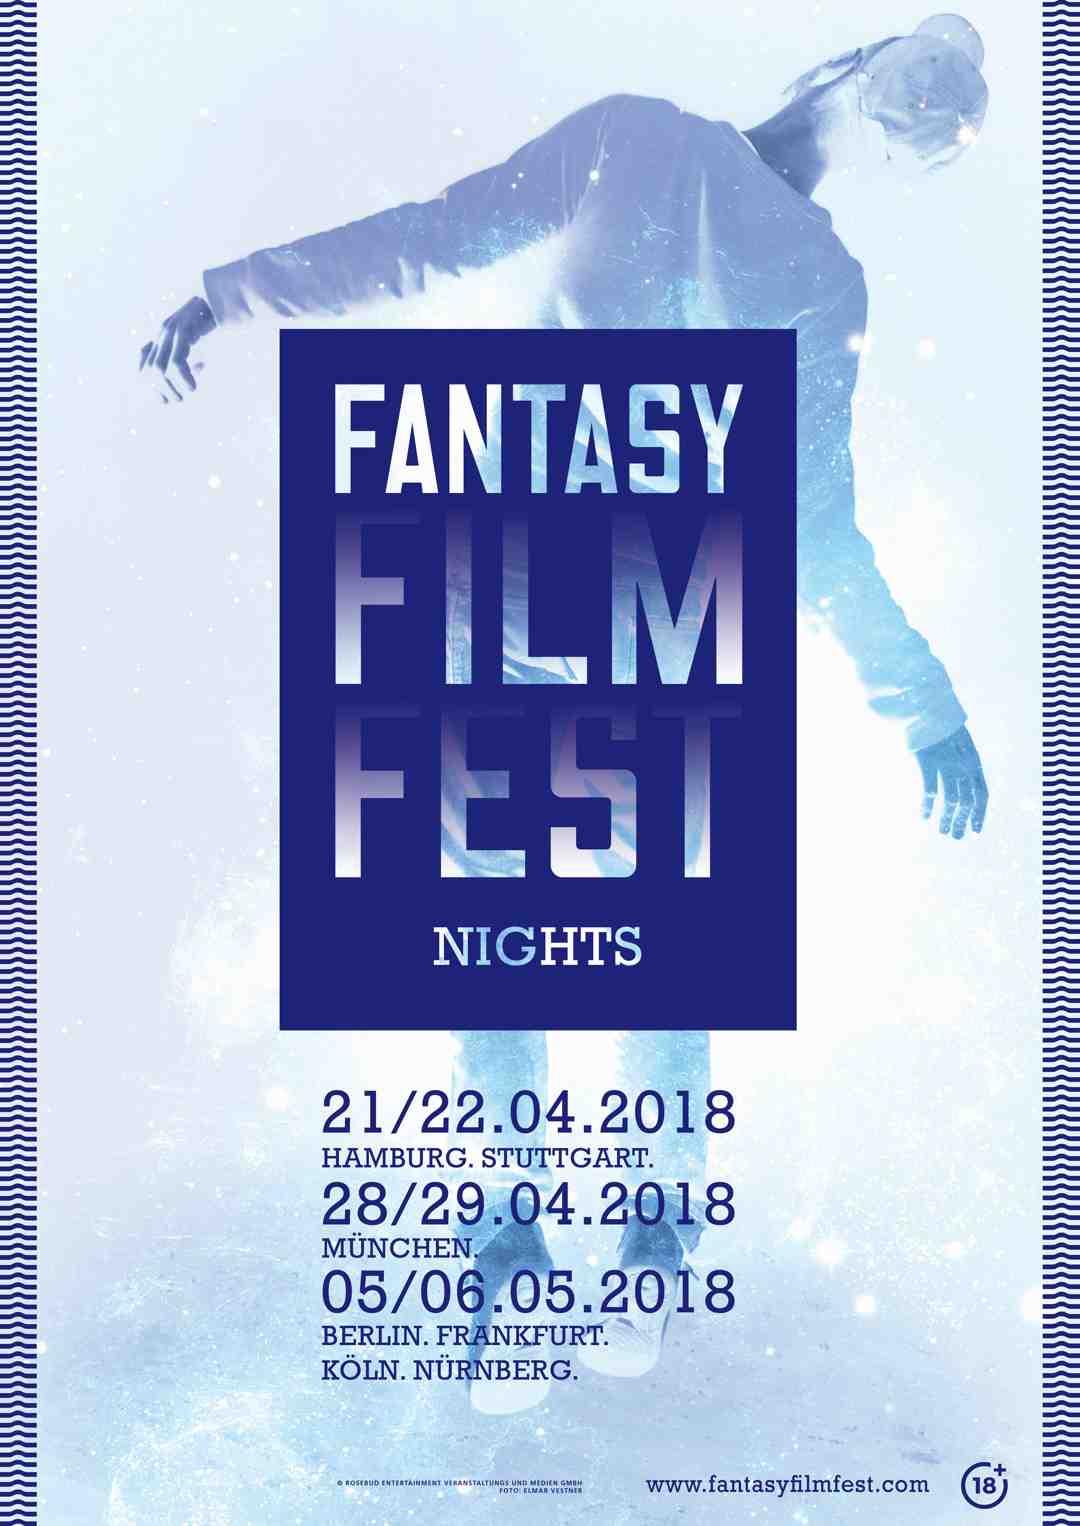 Fantasy Filmfest Nights 2018